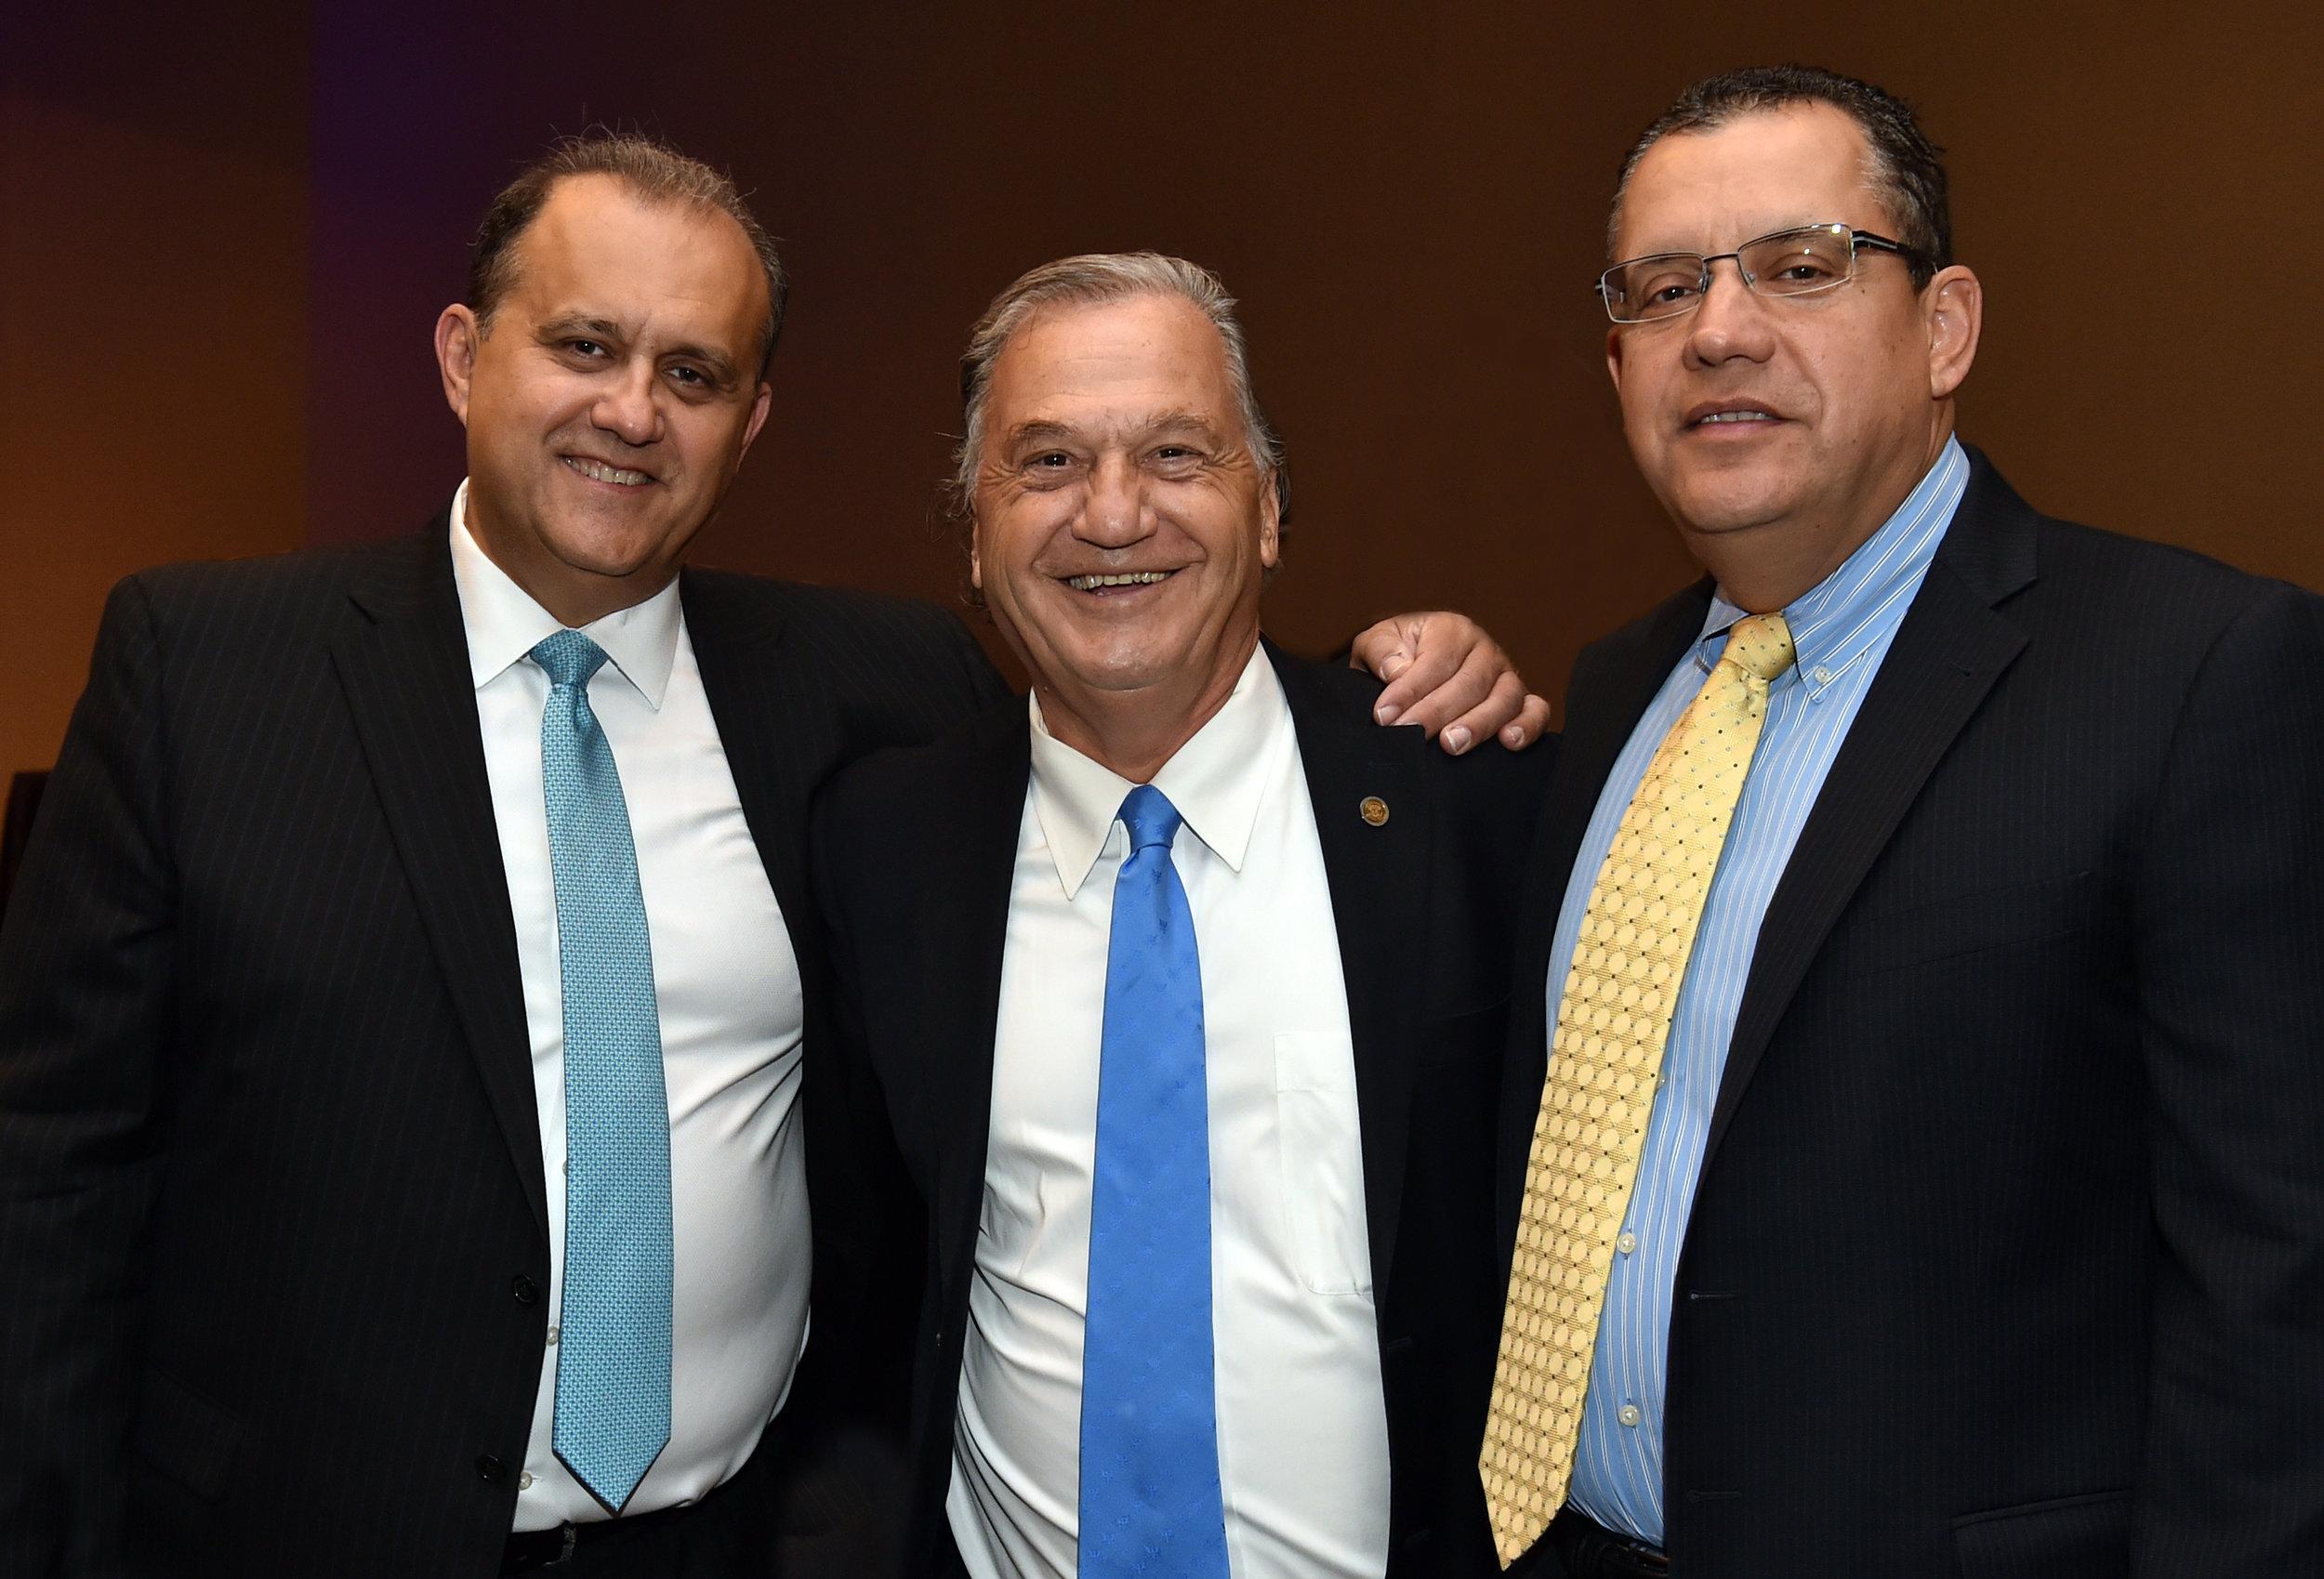 Nick Larigakis, George Mermelas, and Constantine Larigakis.